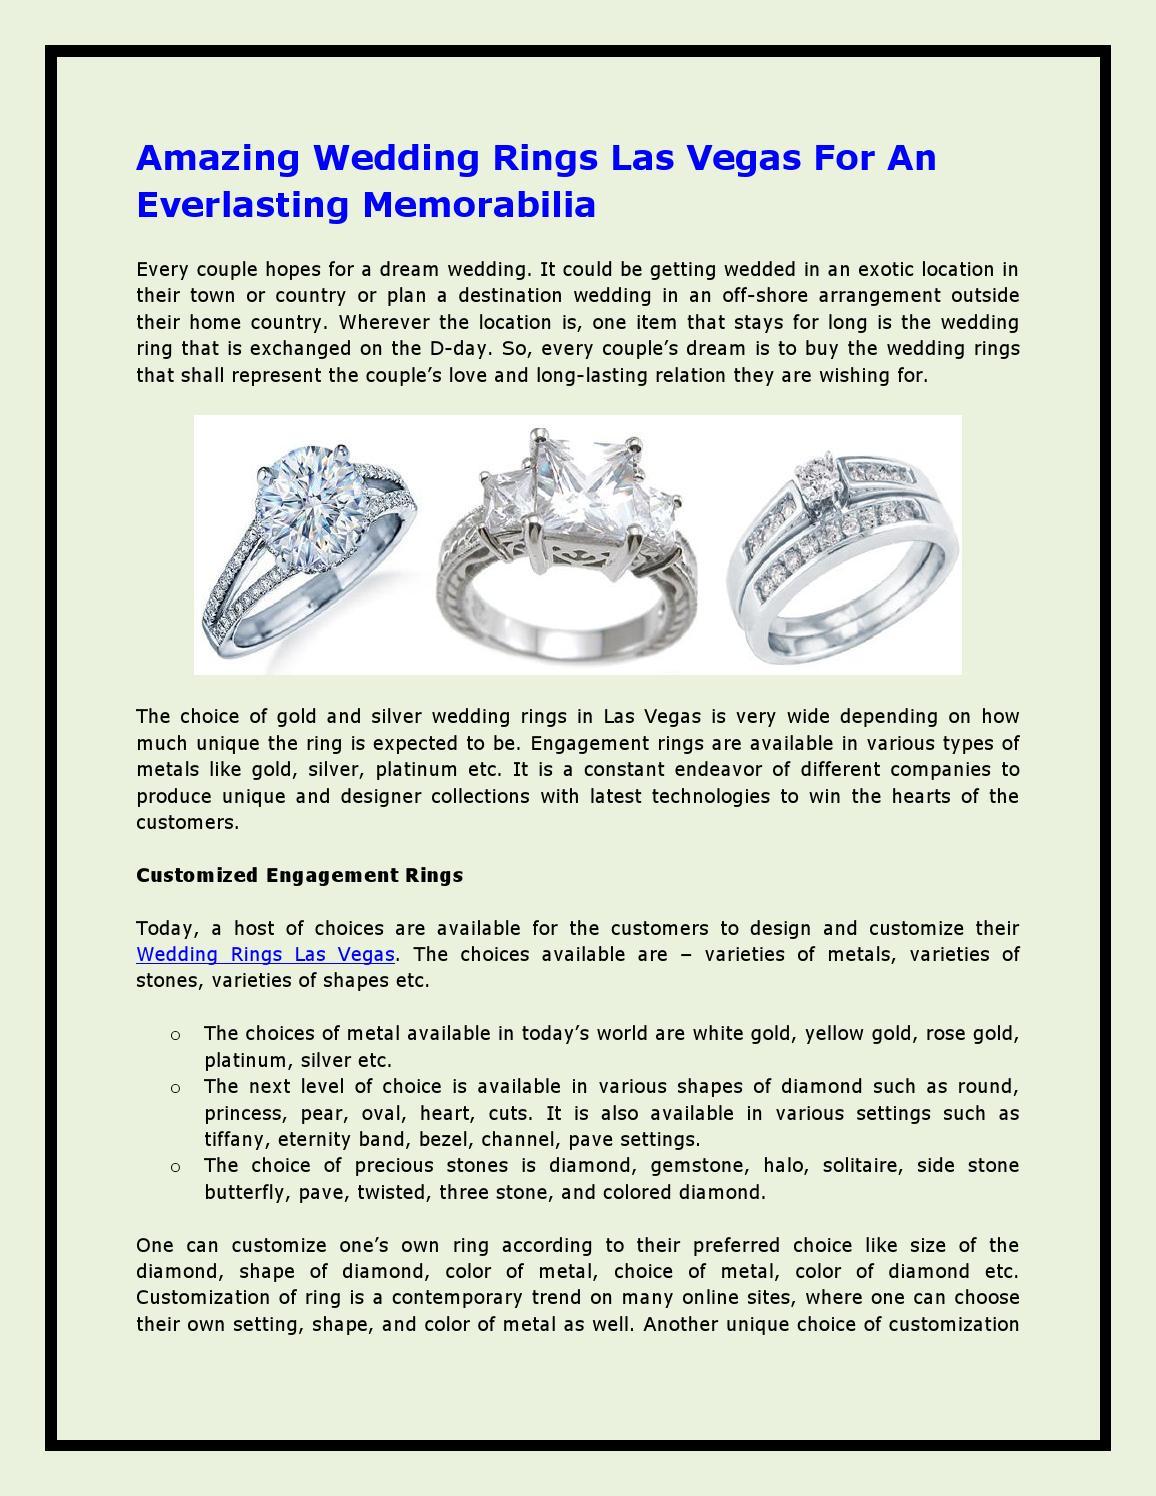 Amazing Wedding Rings Las Vegas For An Everlasting Memorabilia By Zaragoza Jewelers Issuu